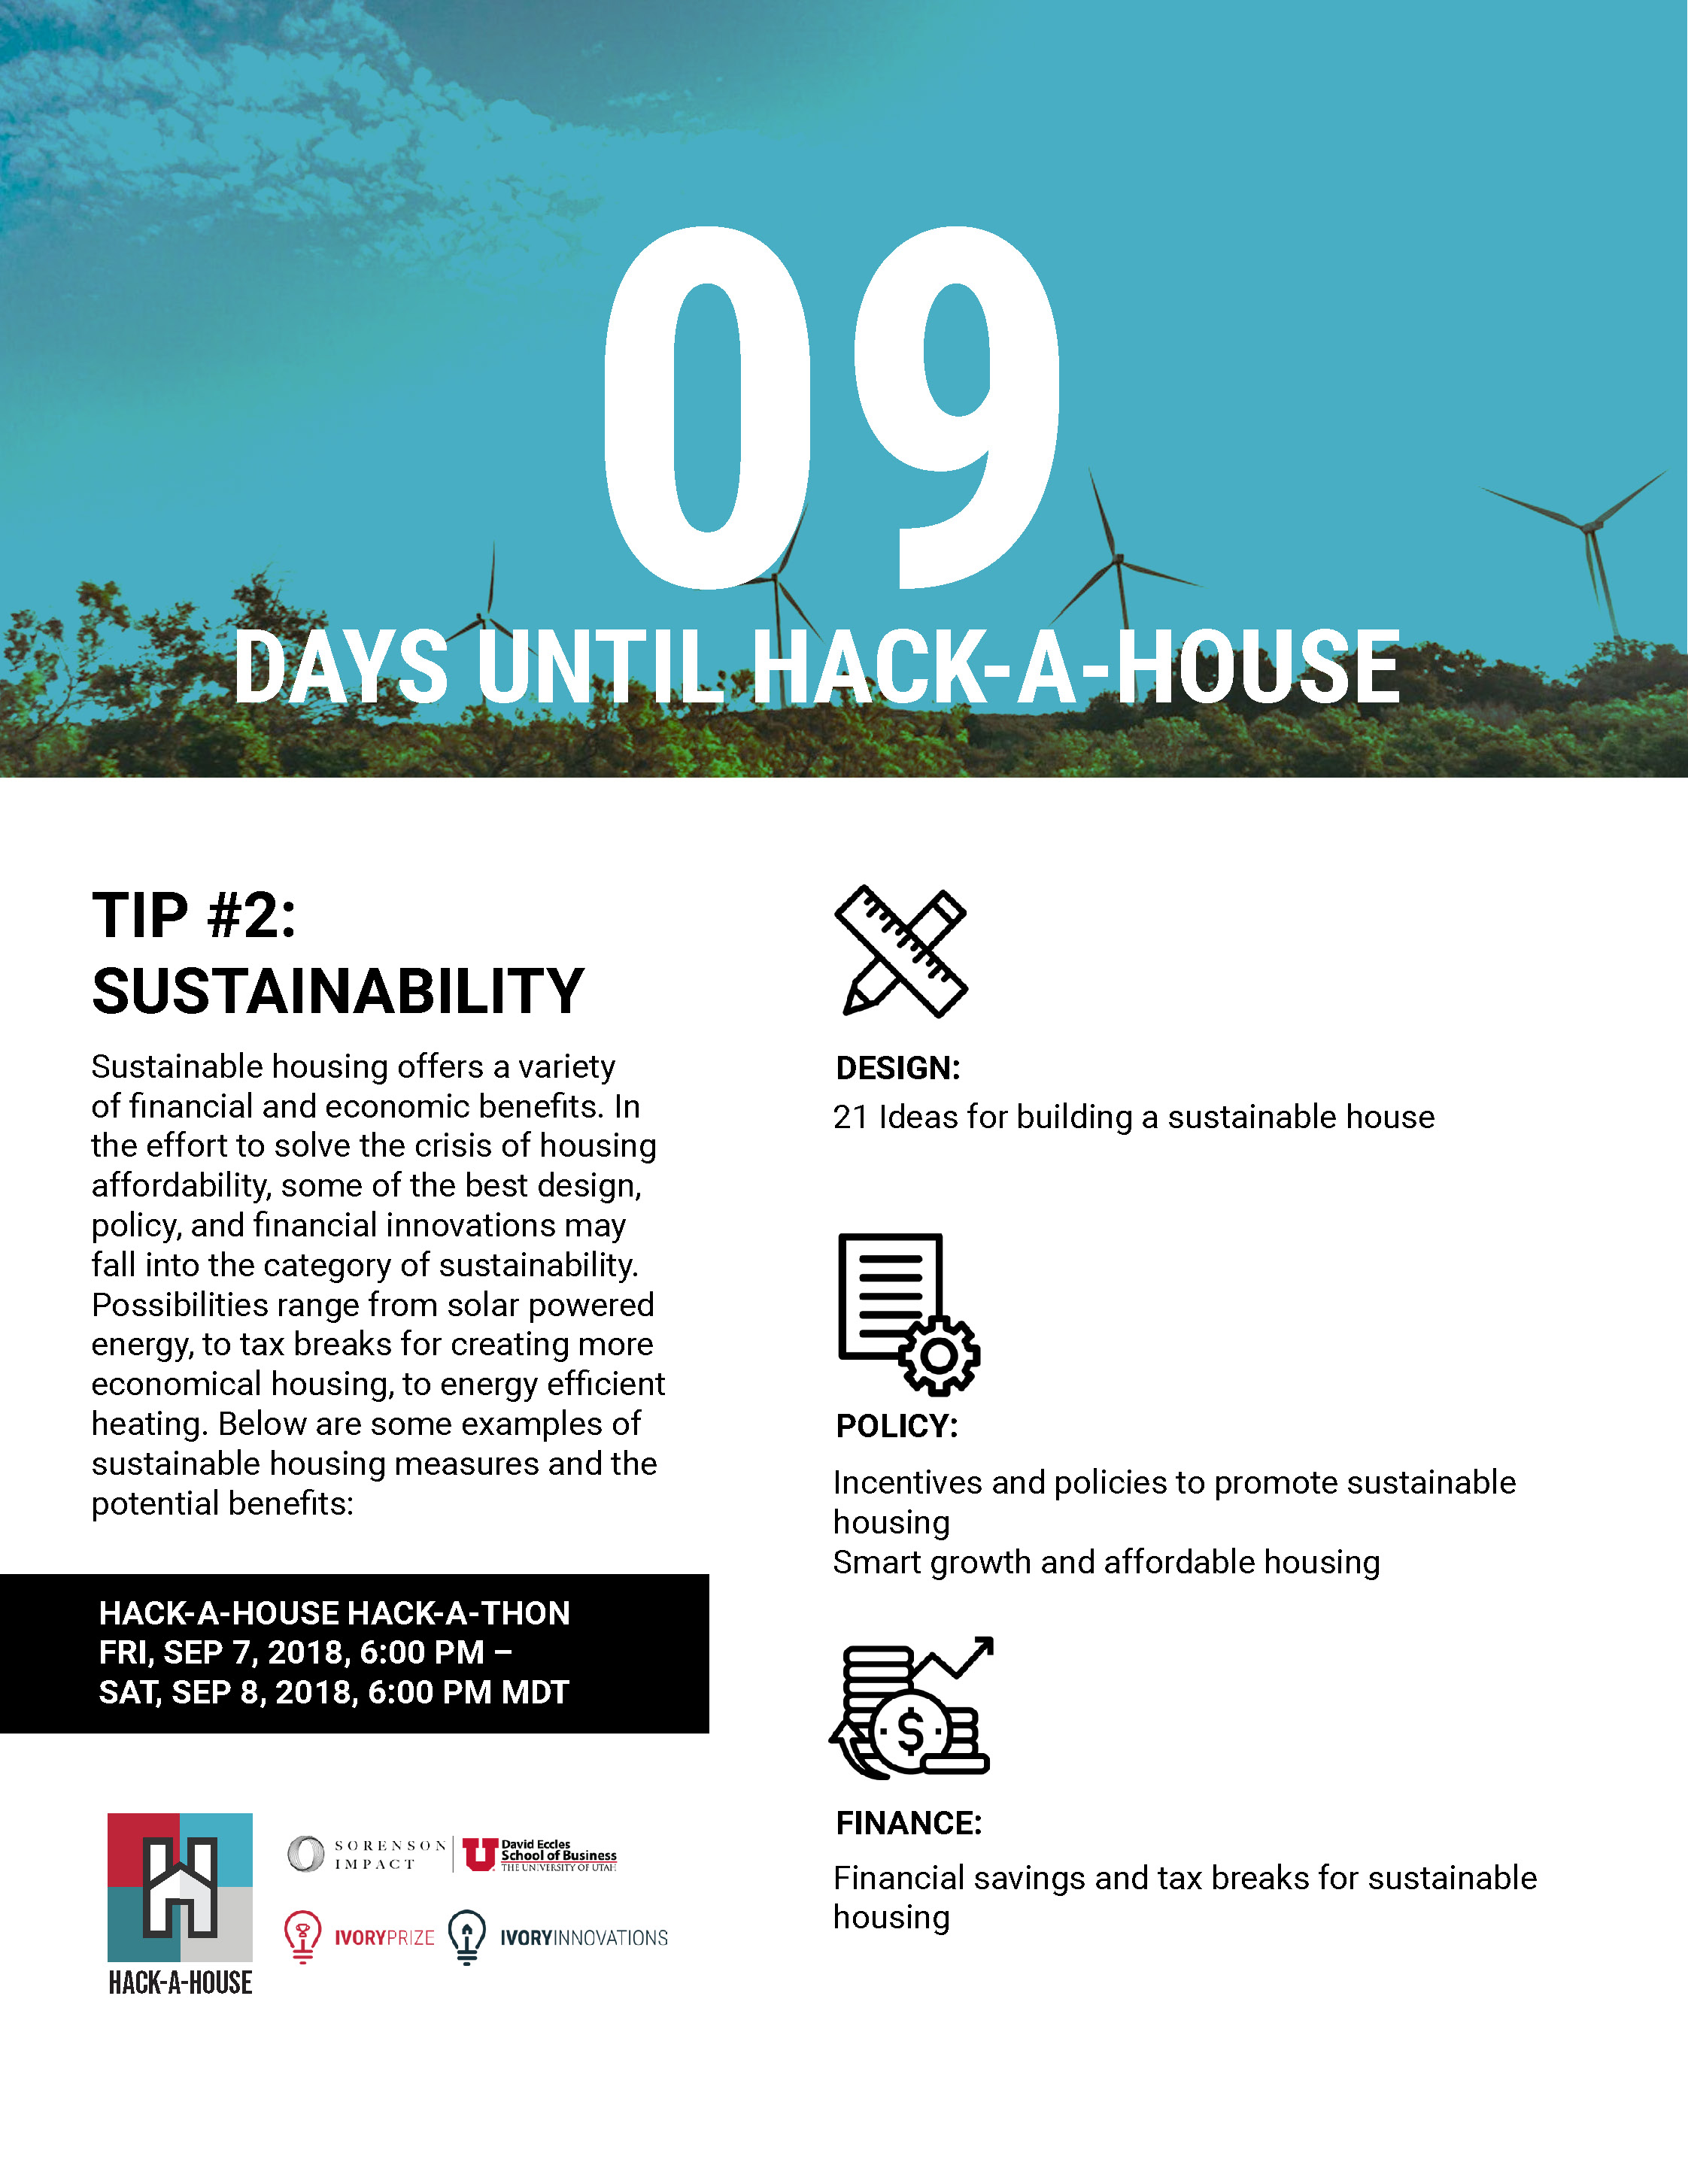 hack-a-house countdown_02.jpg